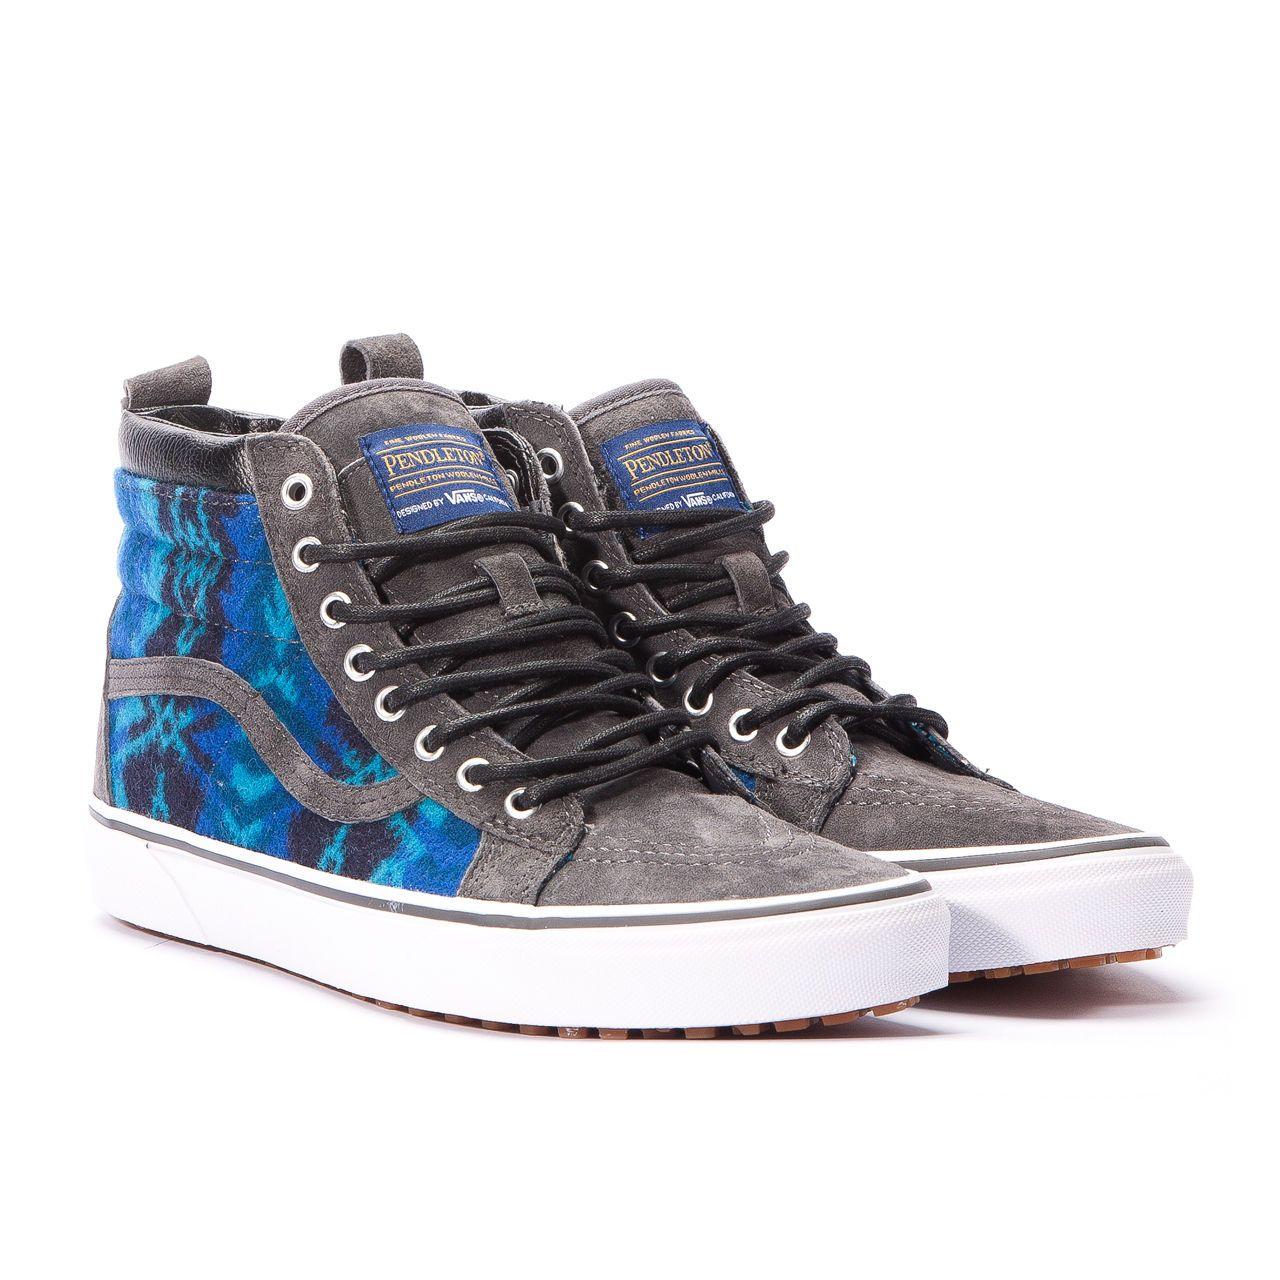 Vans x Pendleton Sk8-Hi MTE (Tribal / Asphalt) Sneaker Schuhe! in Kleidung & Accessoires, Herrenschuhe, Turnschuhe & Sneaker | eBay